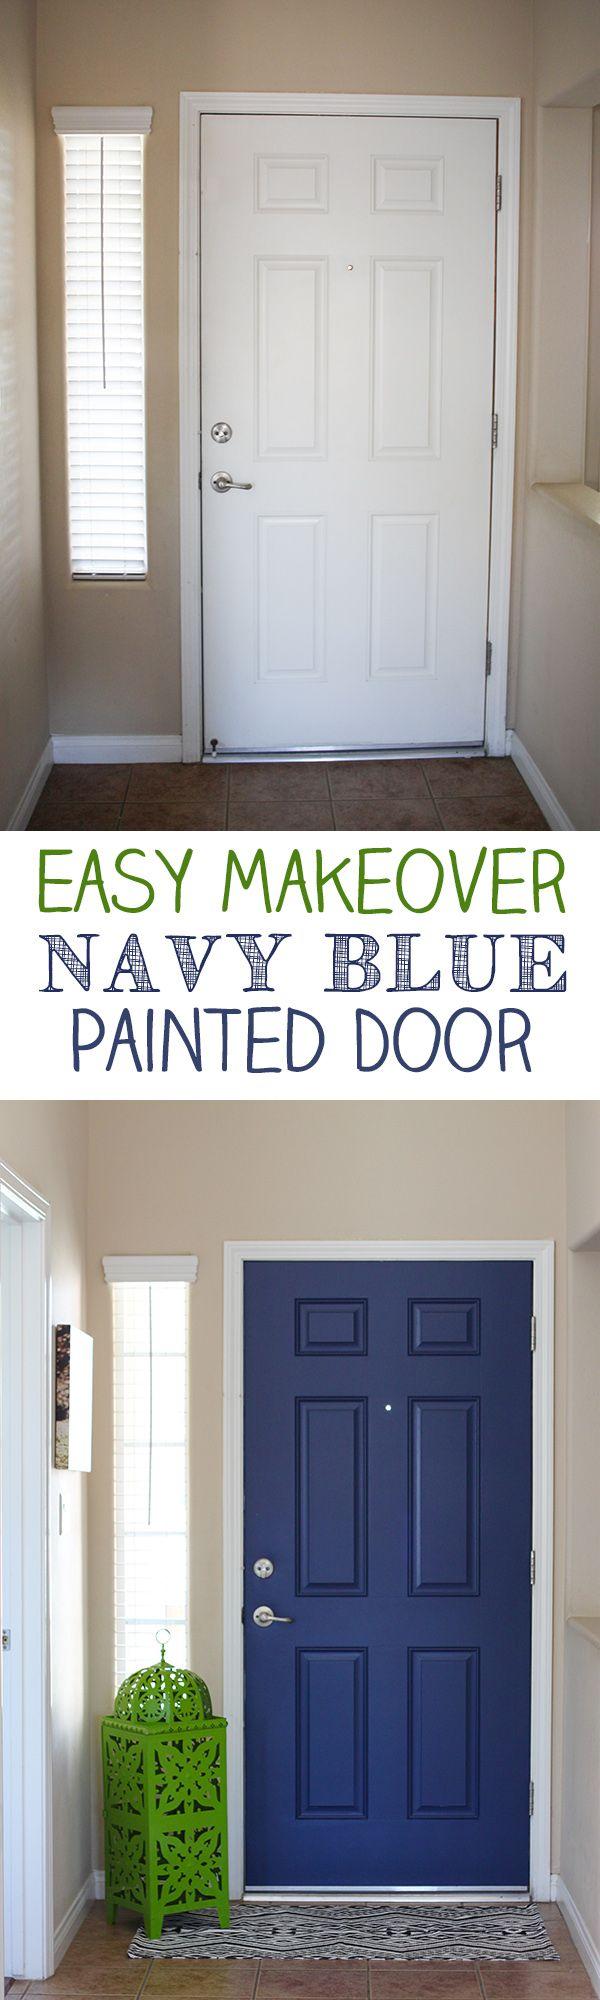 17 Best Ideas About Blue Interiors On Pinterest Dark Blue Walls Navy Walls